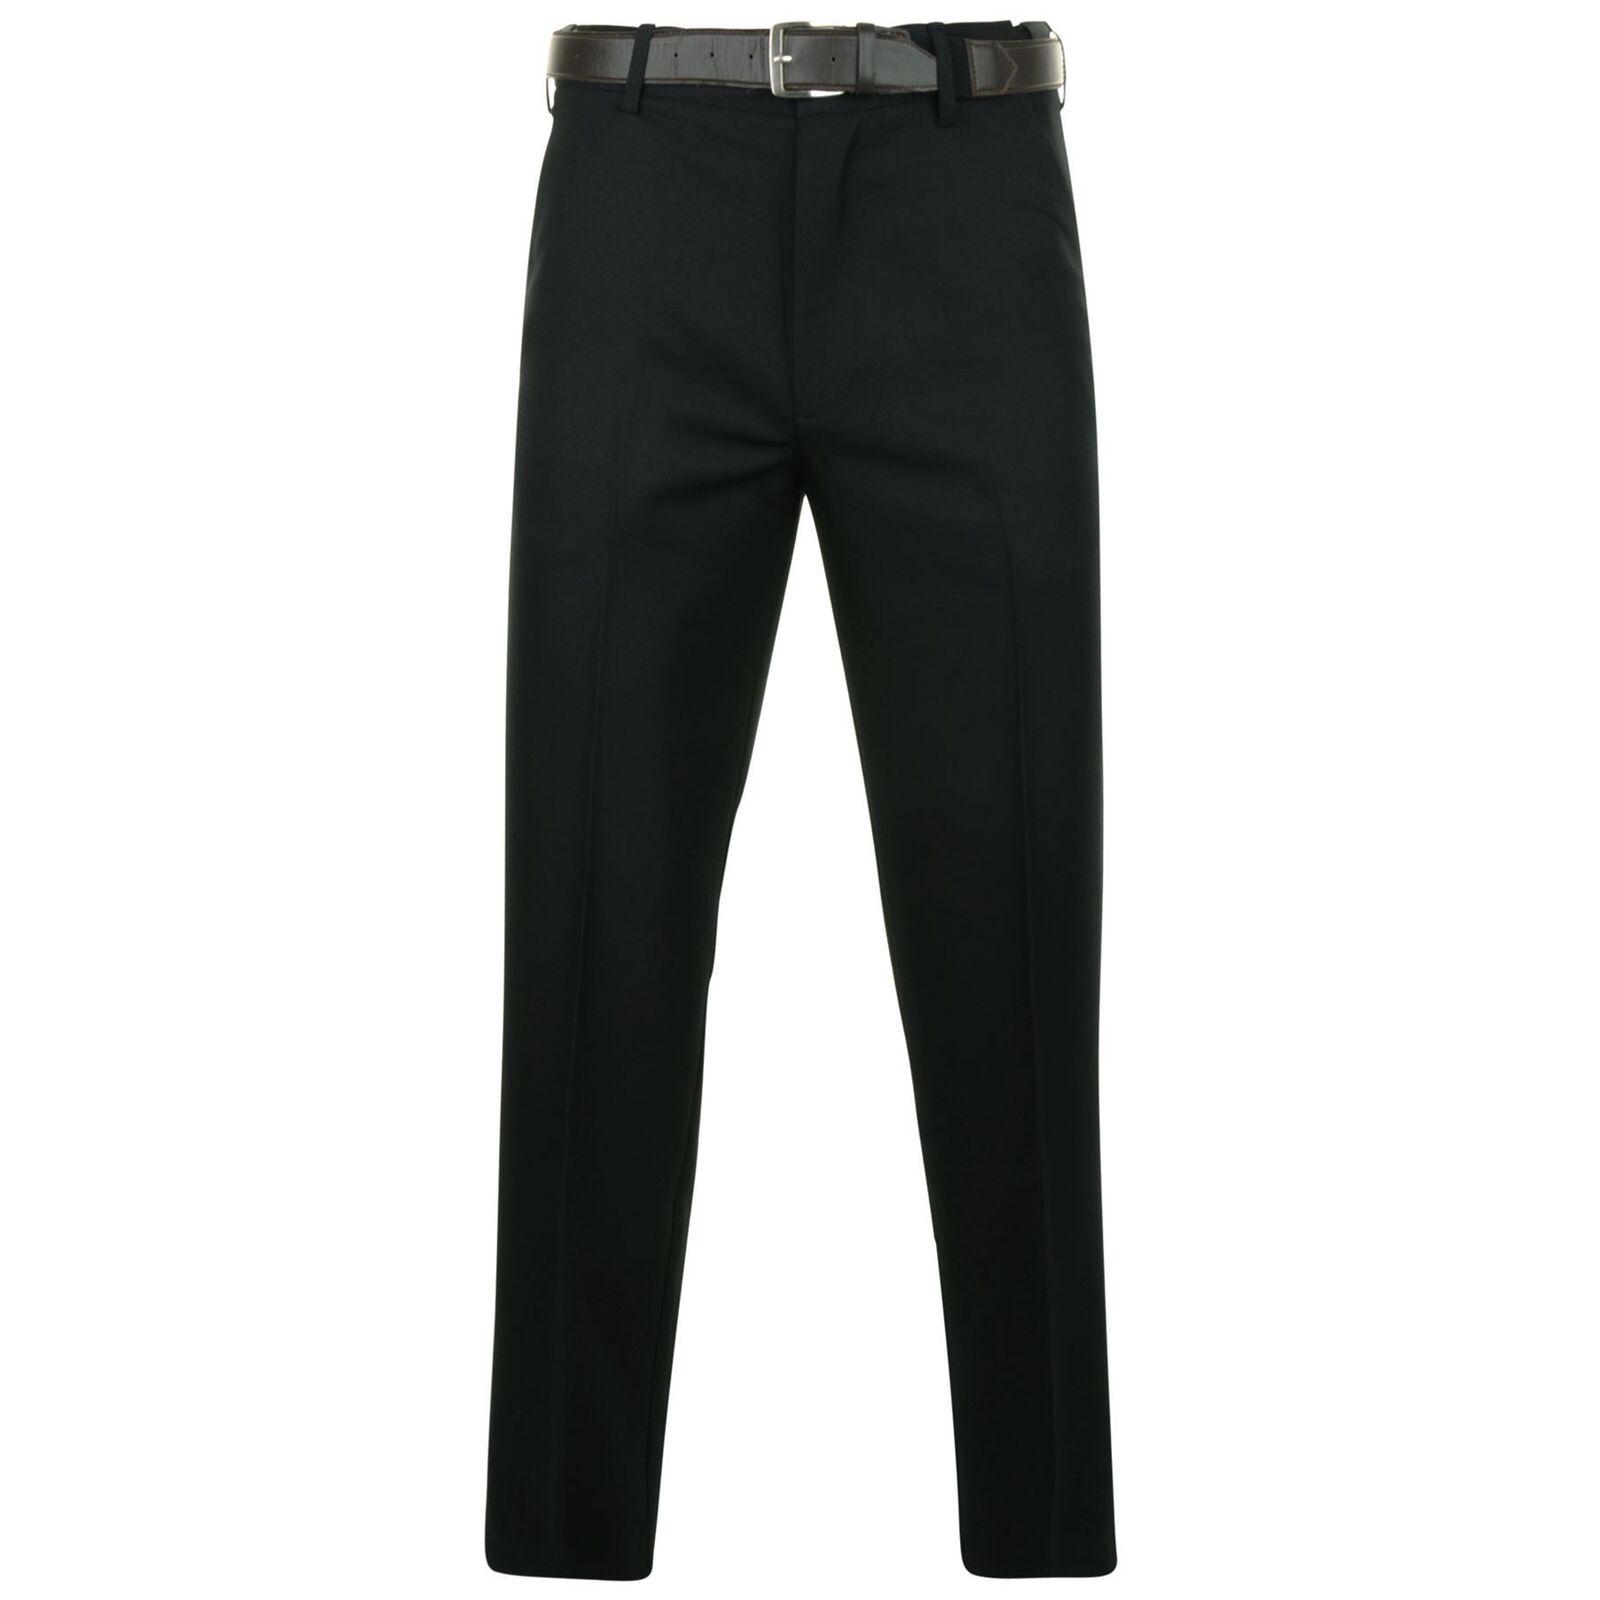 Kam Herren Flexi Größe Formelle Hose (259) Schwarz Größe 40-60 L27-33